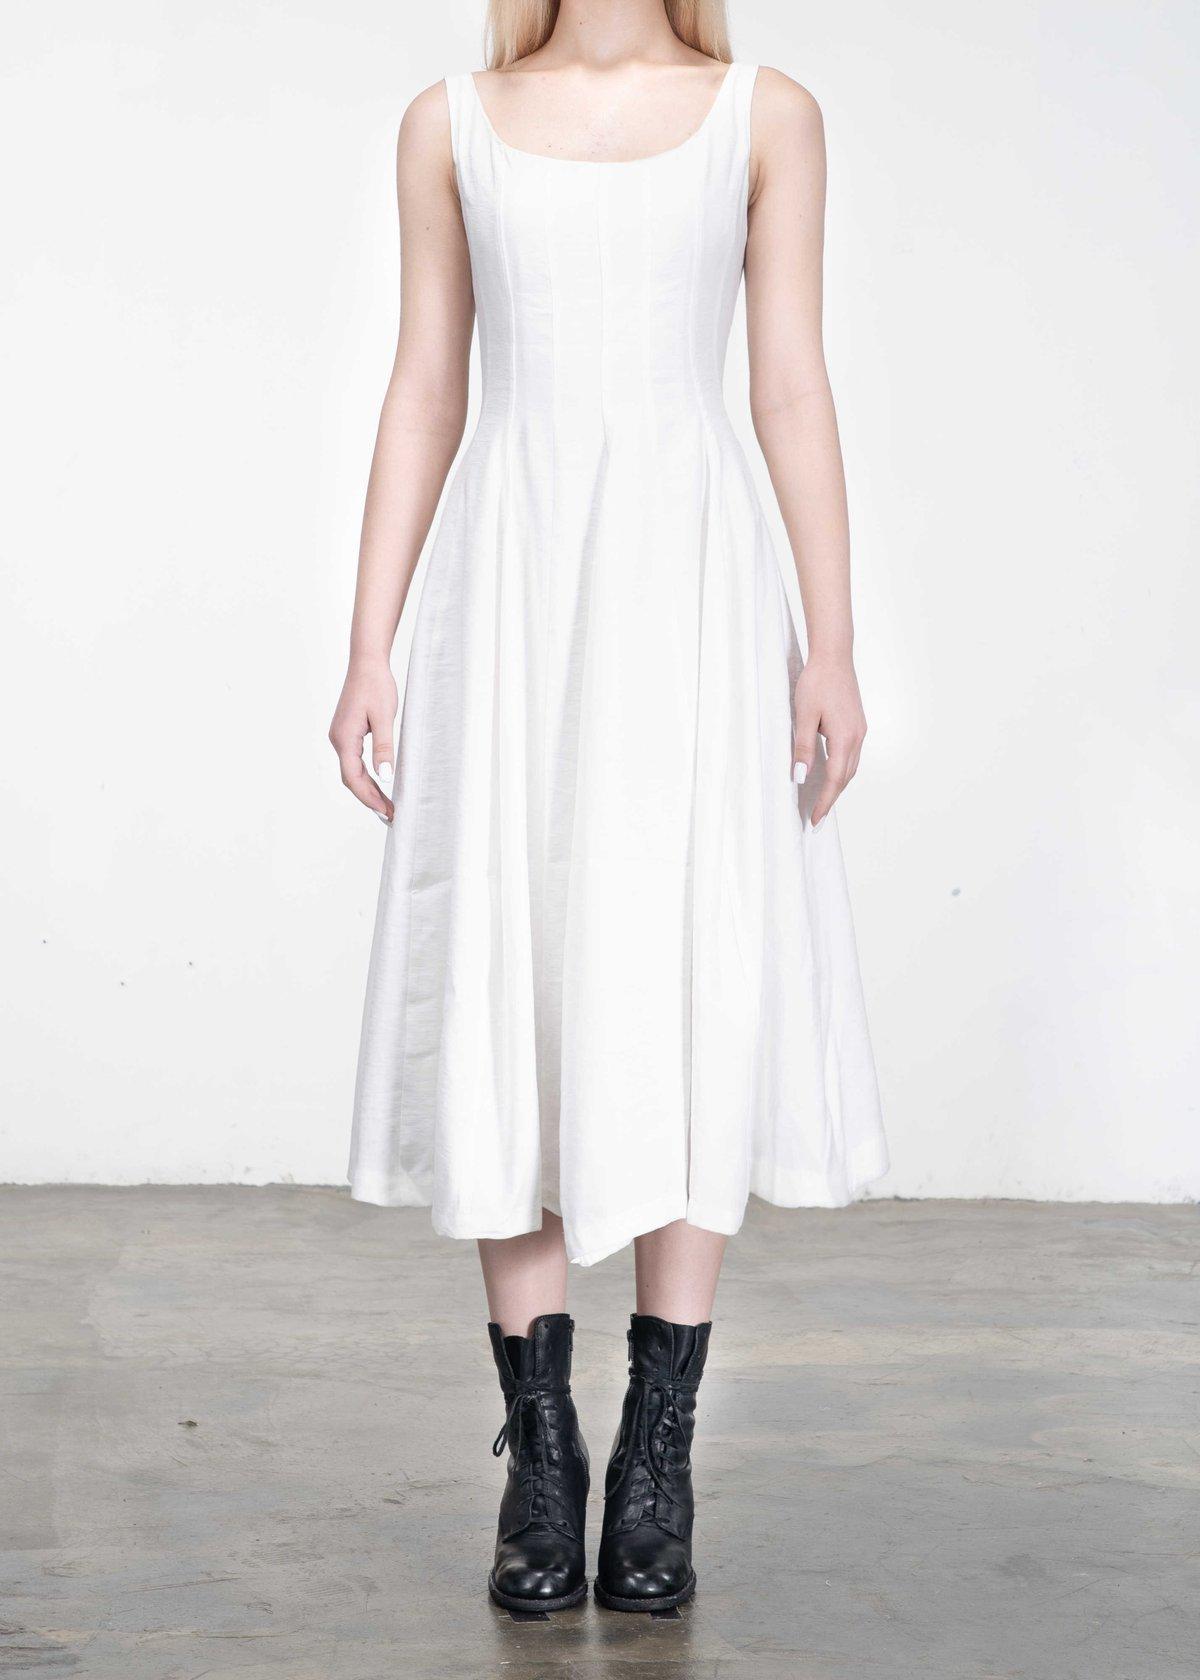 Image of SAMPLE SALE - Corset Dress White